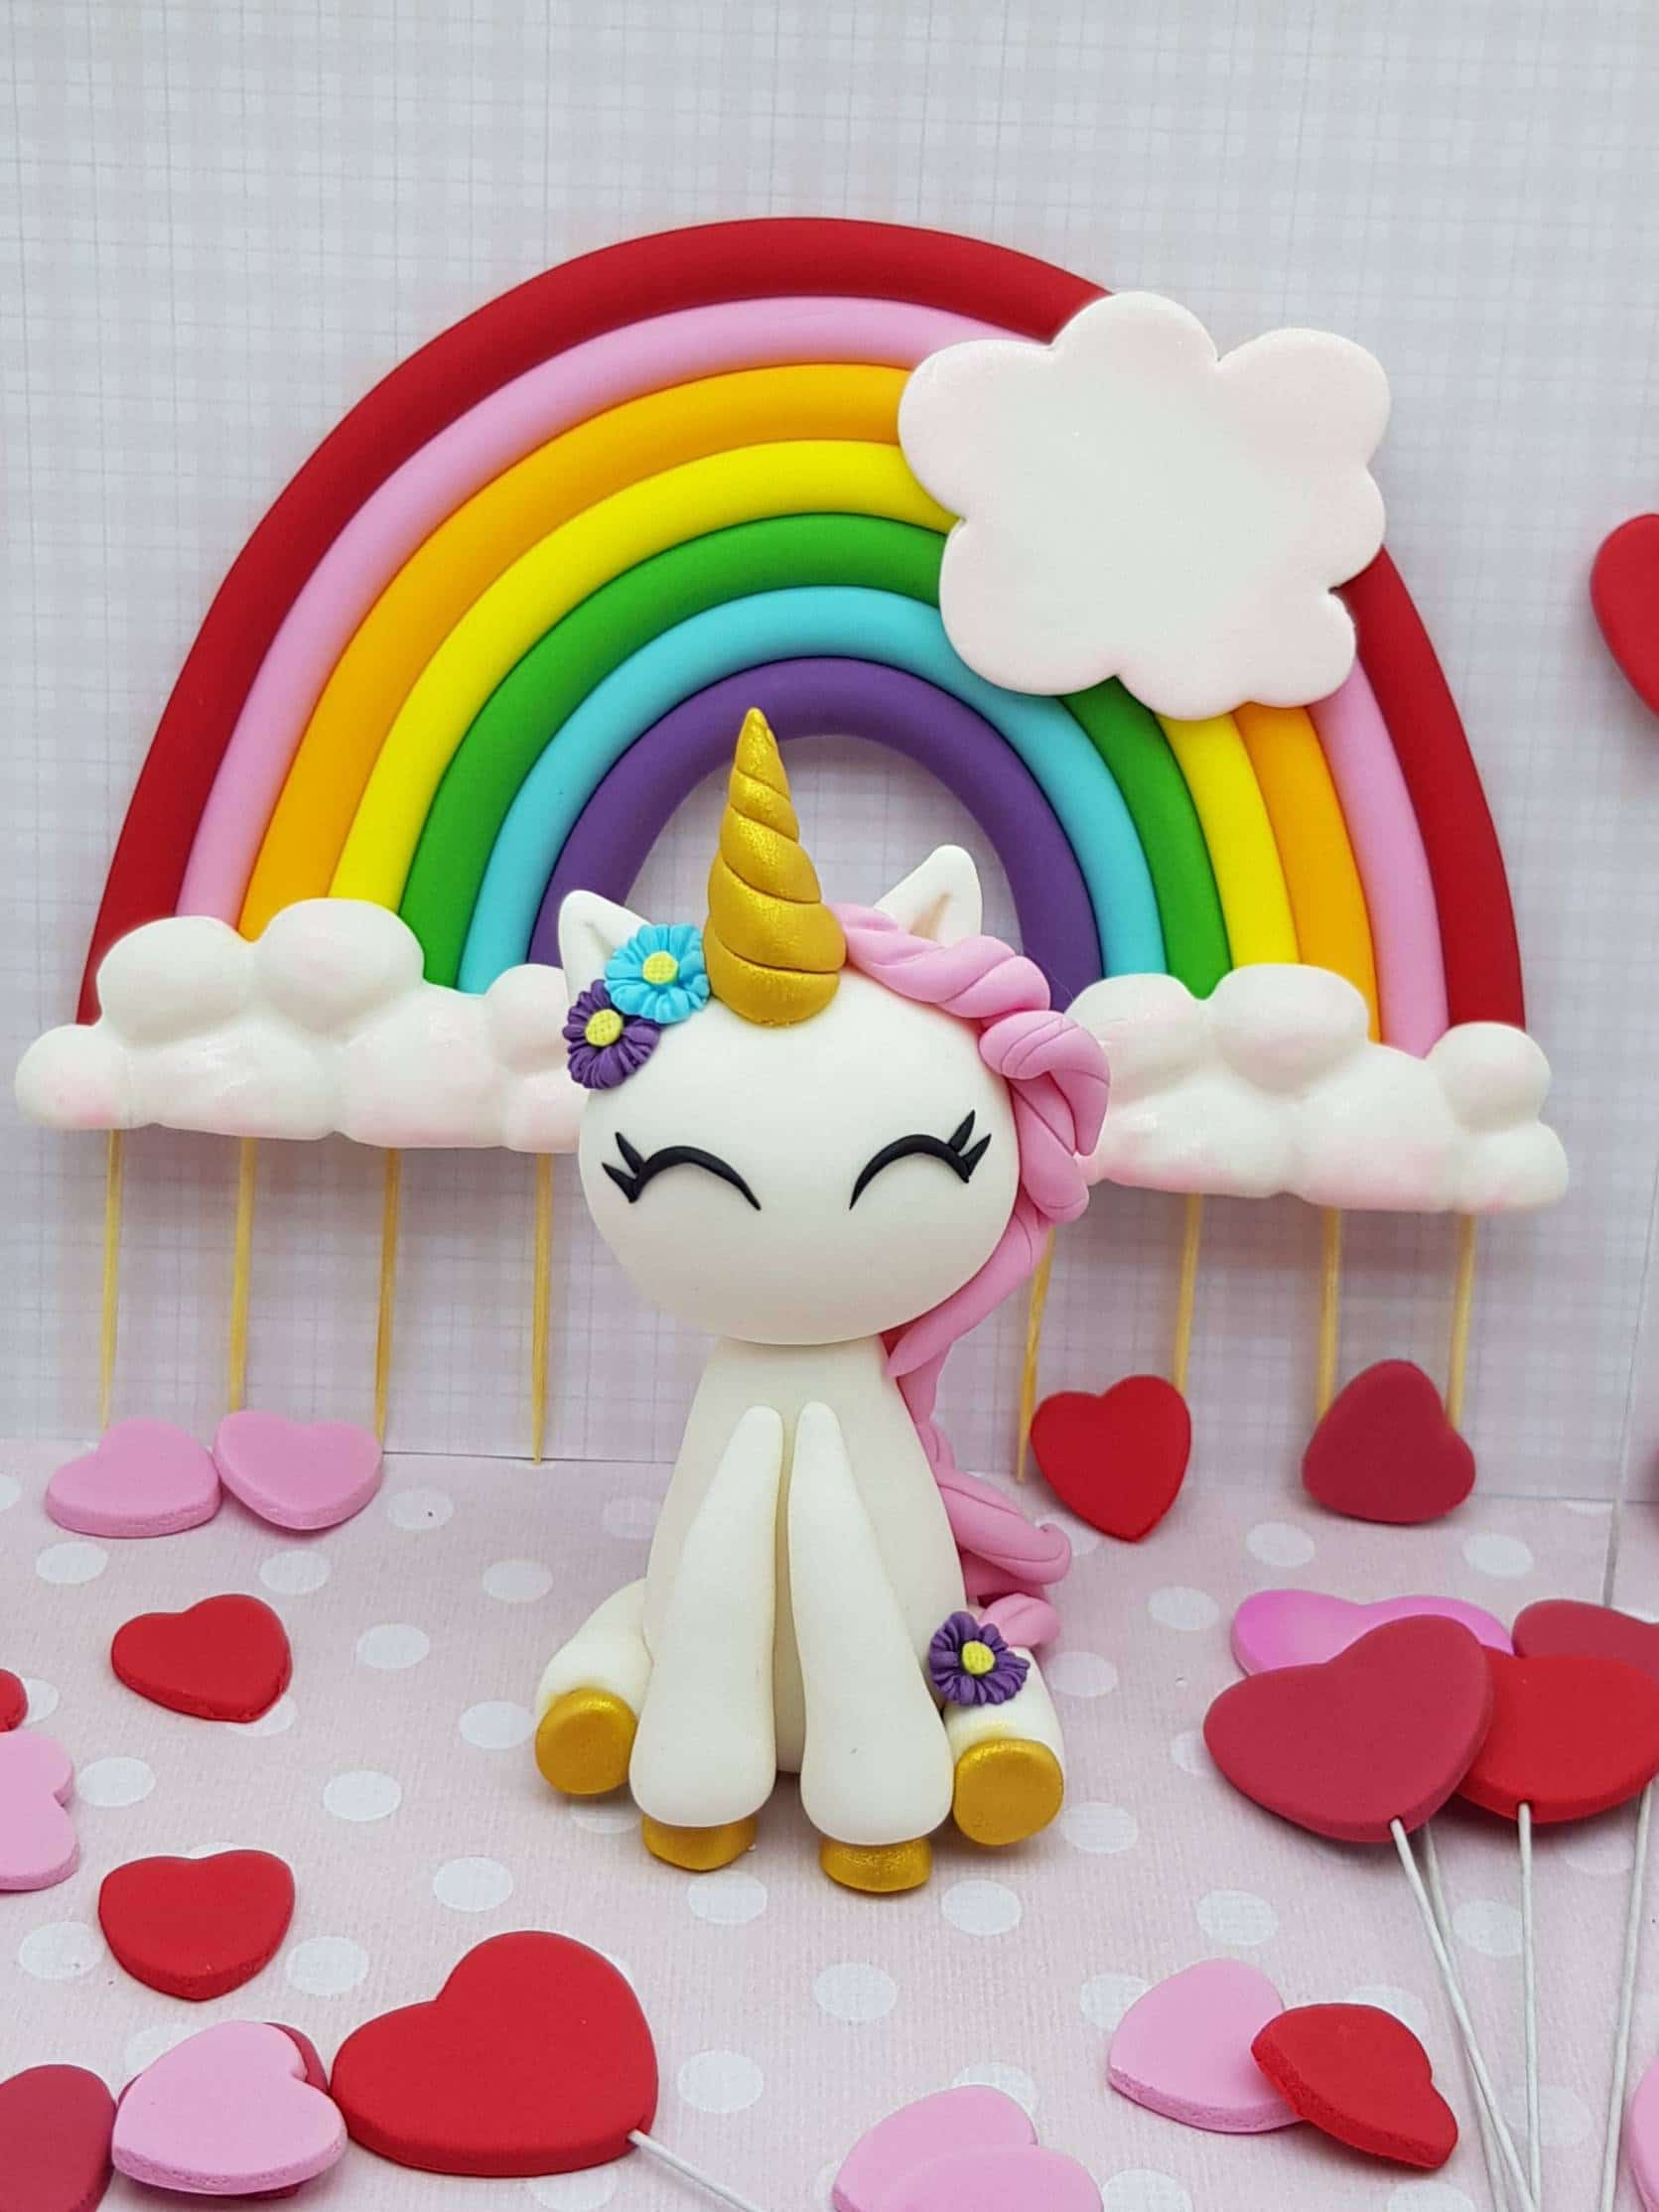 Sweet Little Unicorn Cake Topper - Edible Unicorn Topper - Unicorn Birthday - Rainbow Cake - Fondant Decoration